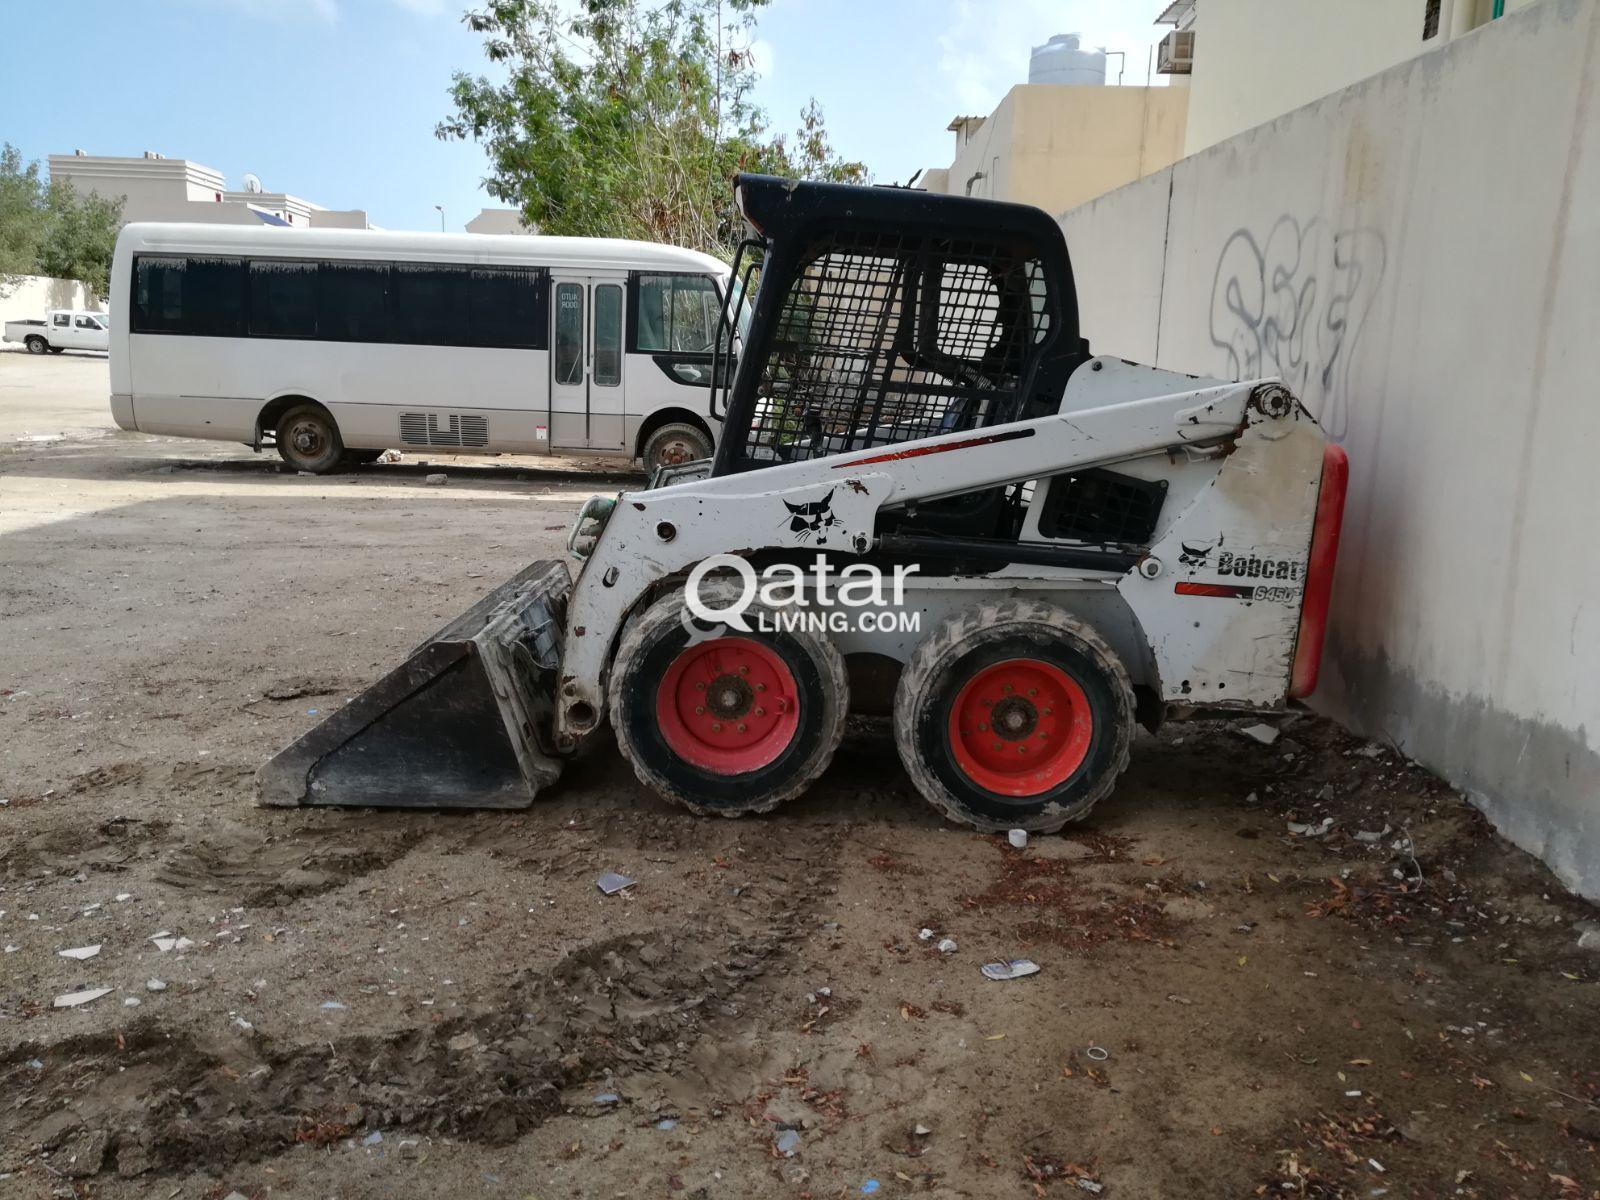 Bobcat s450 | Qatar Living